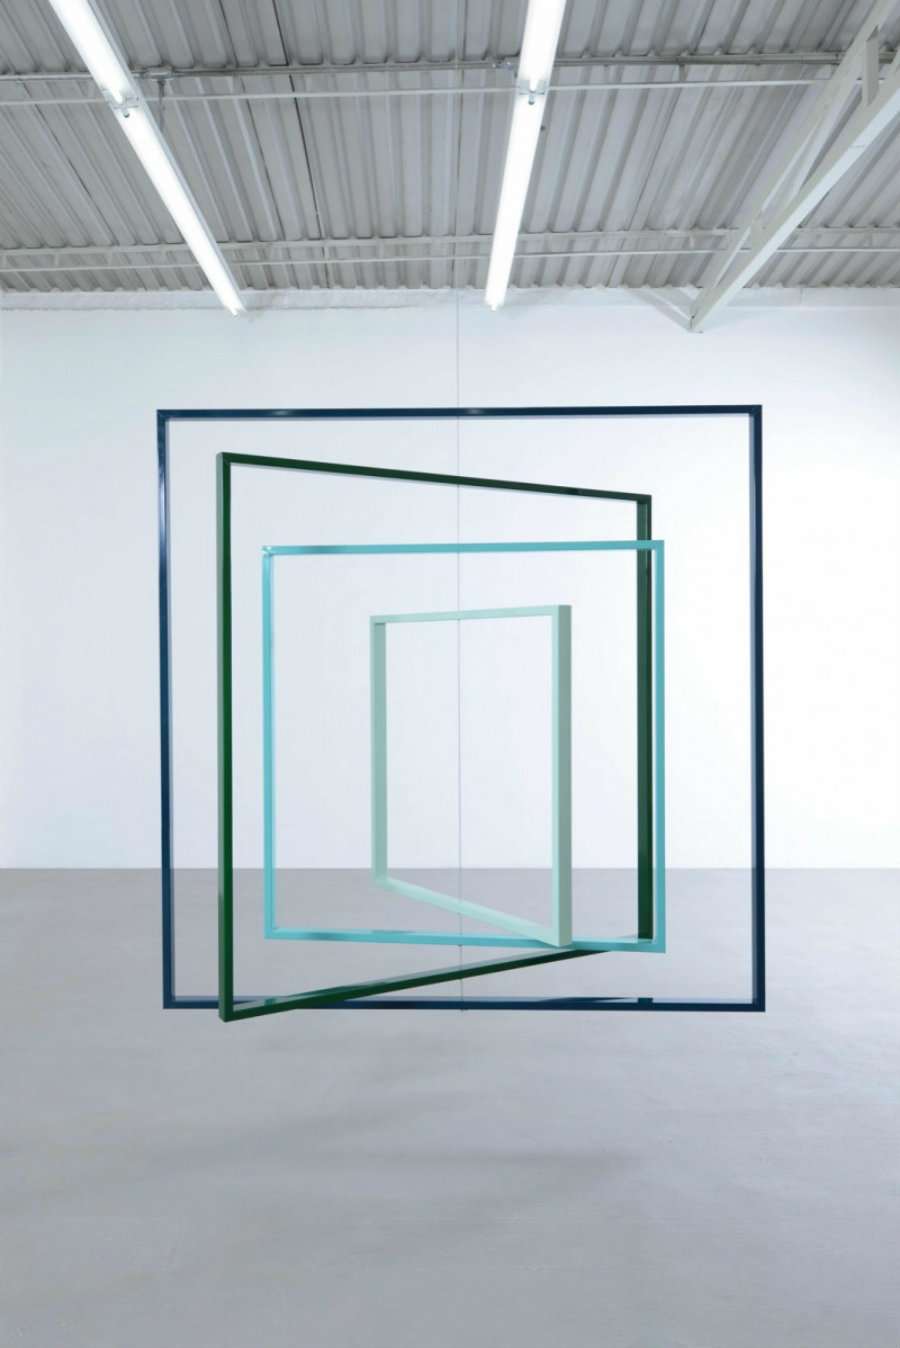 Art Basel Hong Kong 2019: What we know so far